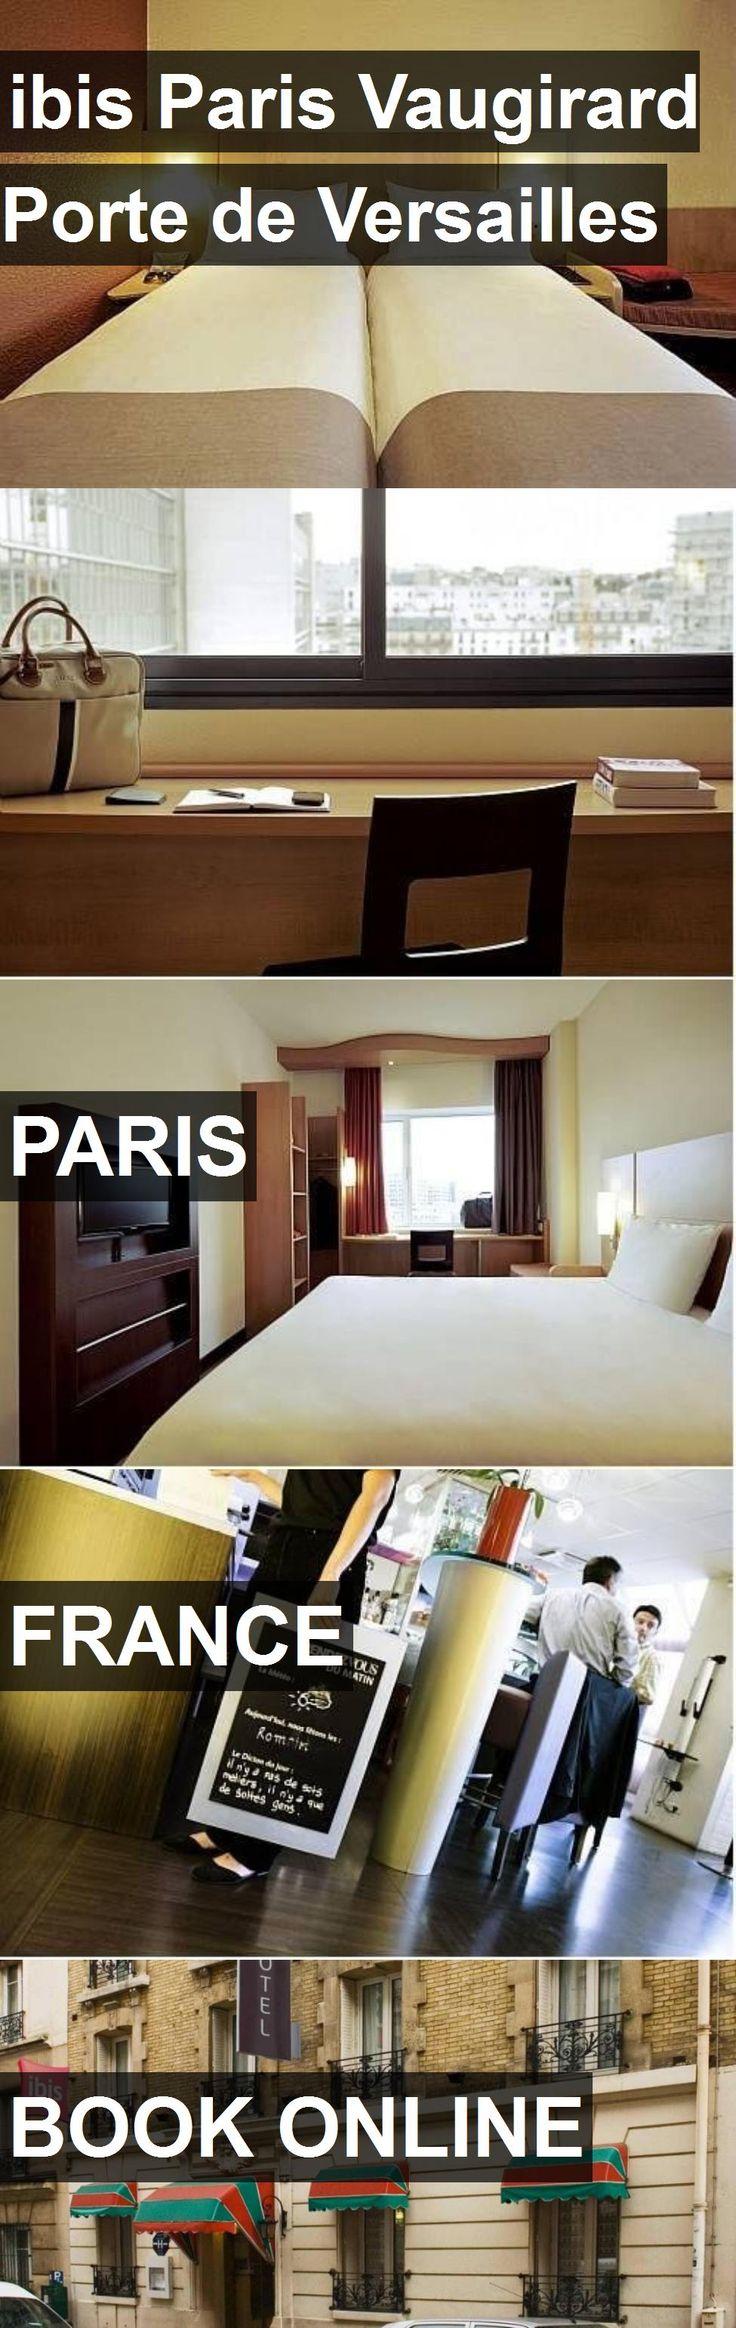 Hotel ibis Paris Vaugirard Porte de Versailles in Paris, France. For more information, photos, reviews and best prices please follow the link. #France #Paris #ibisParisVaugirardPortedeVersailles #hotel #travel #vacation